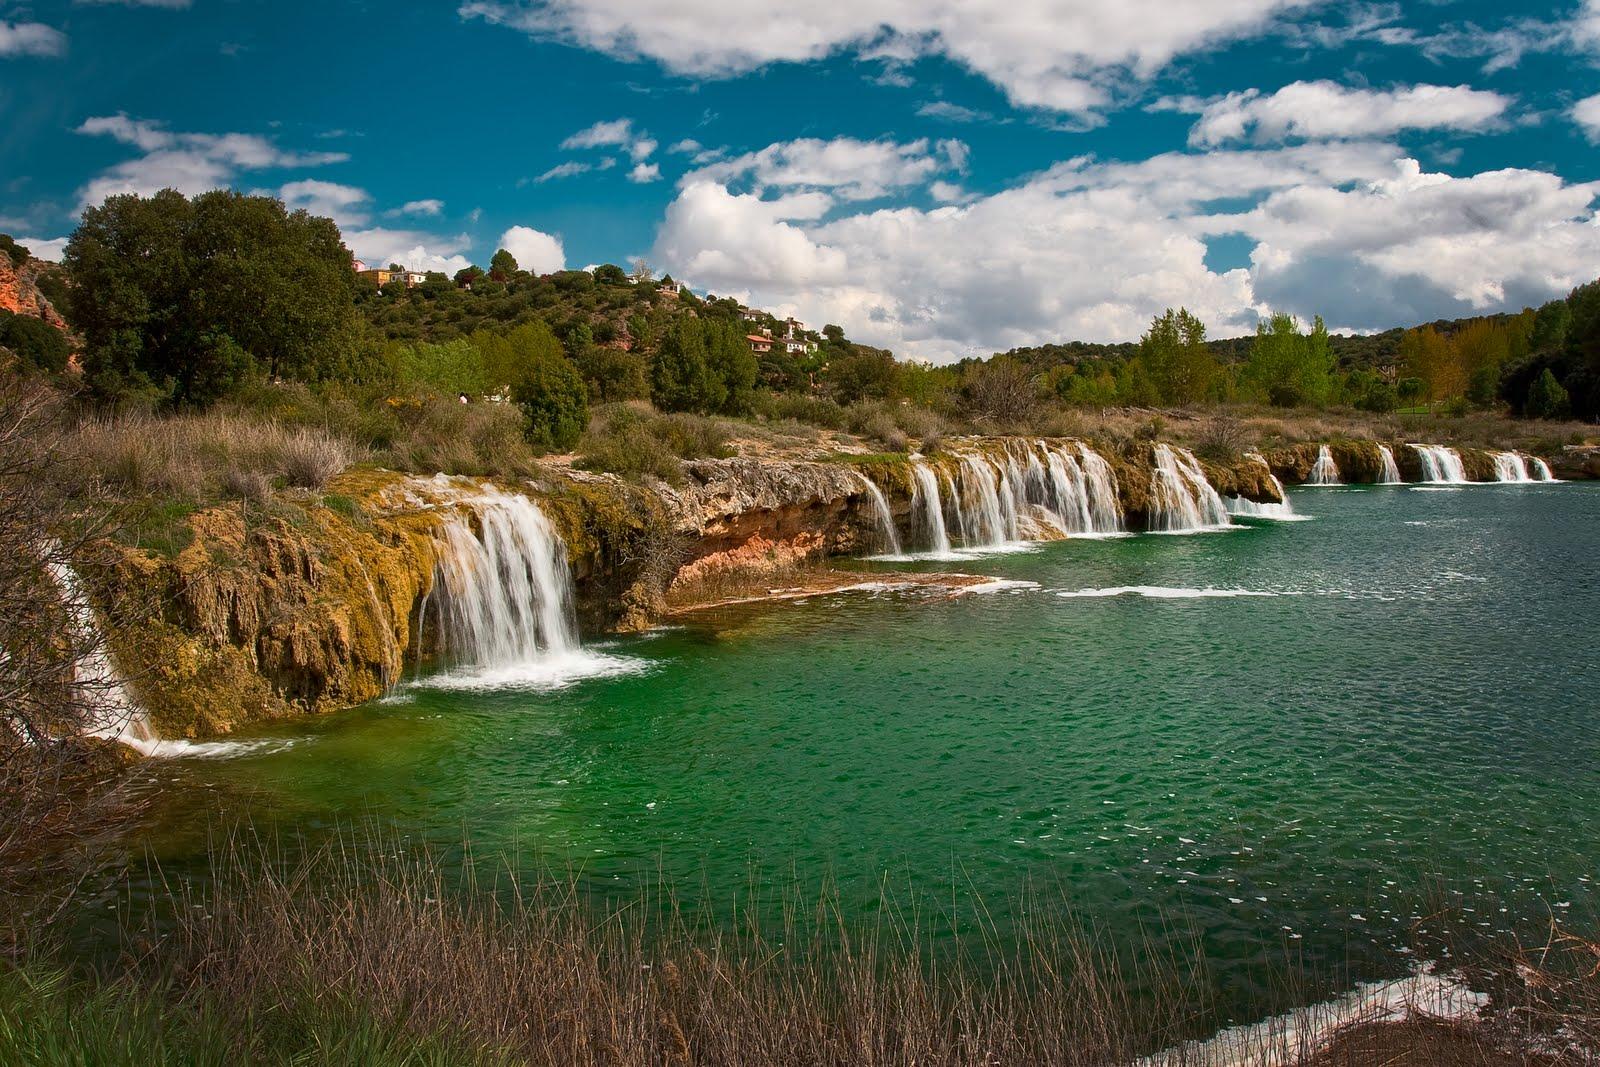 Rural contempor nea parque natural de las lagunas de ruidera for Plastico para impermeabilizar lagunas